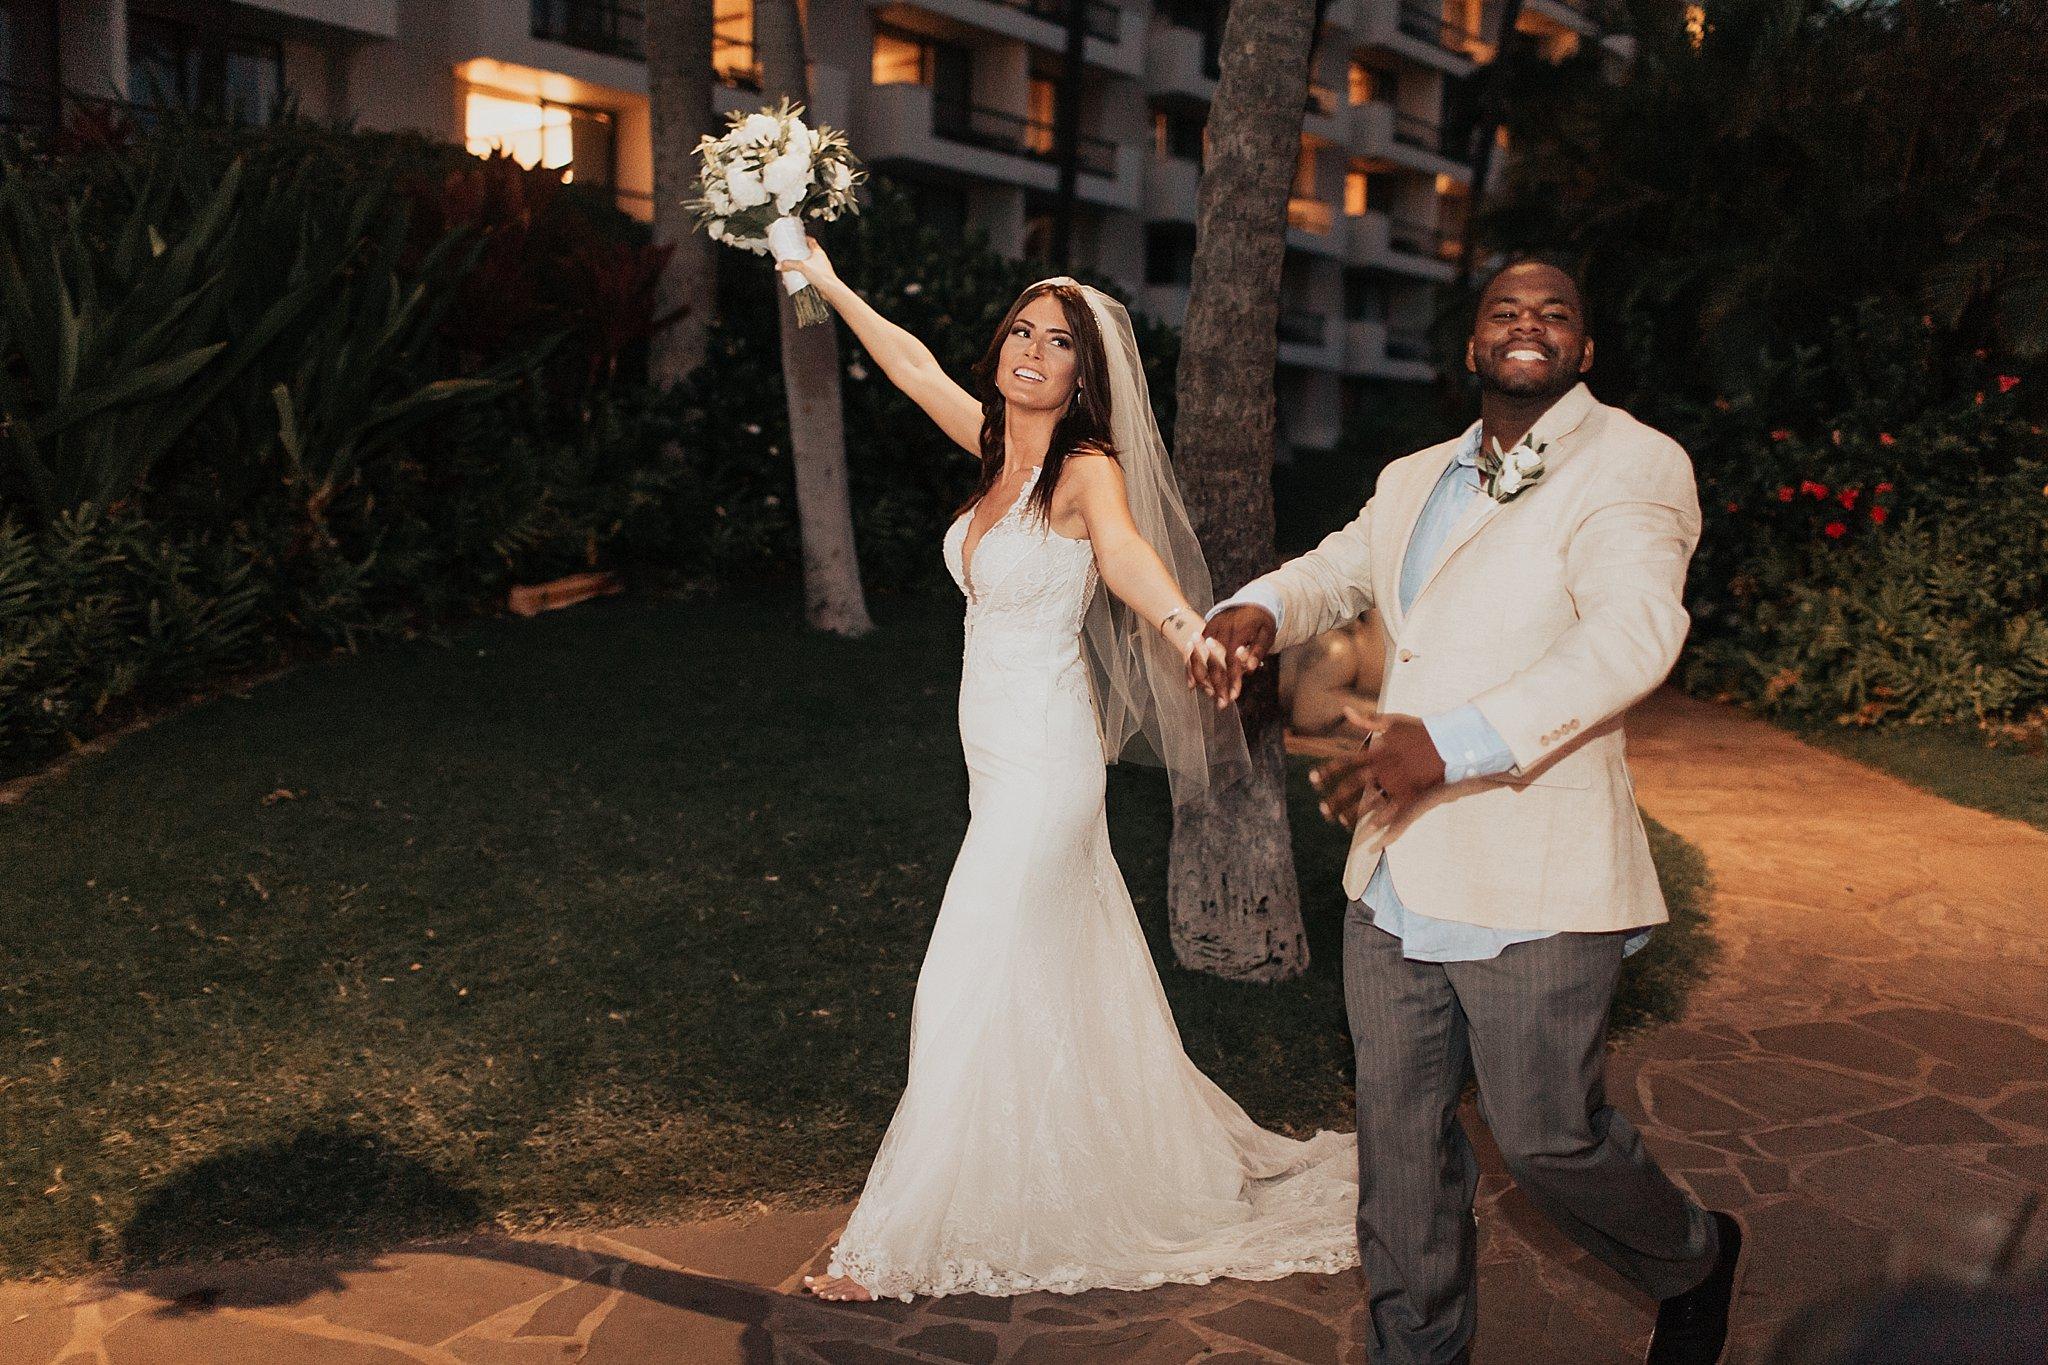 samantha_mcfarlen_bellingham_washington_engagement_photography_seattle_wedding_photographer_0247.jpg